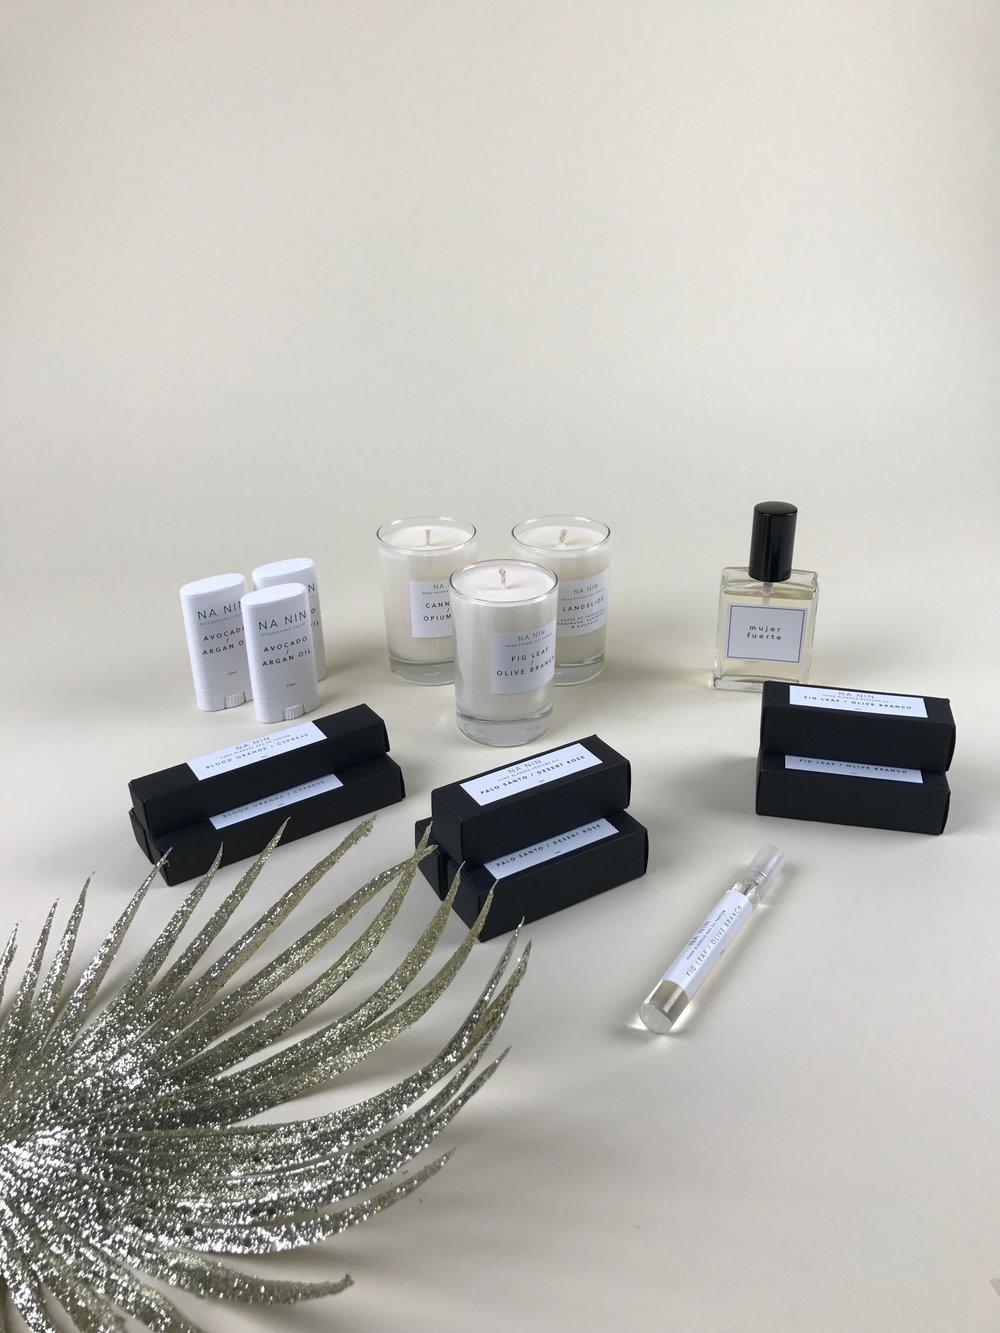 na nin perfume and salve